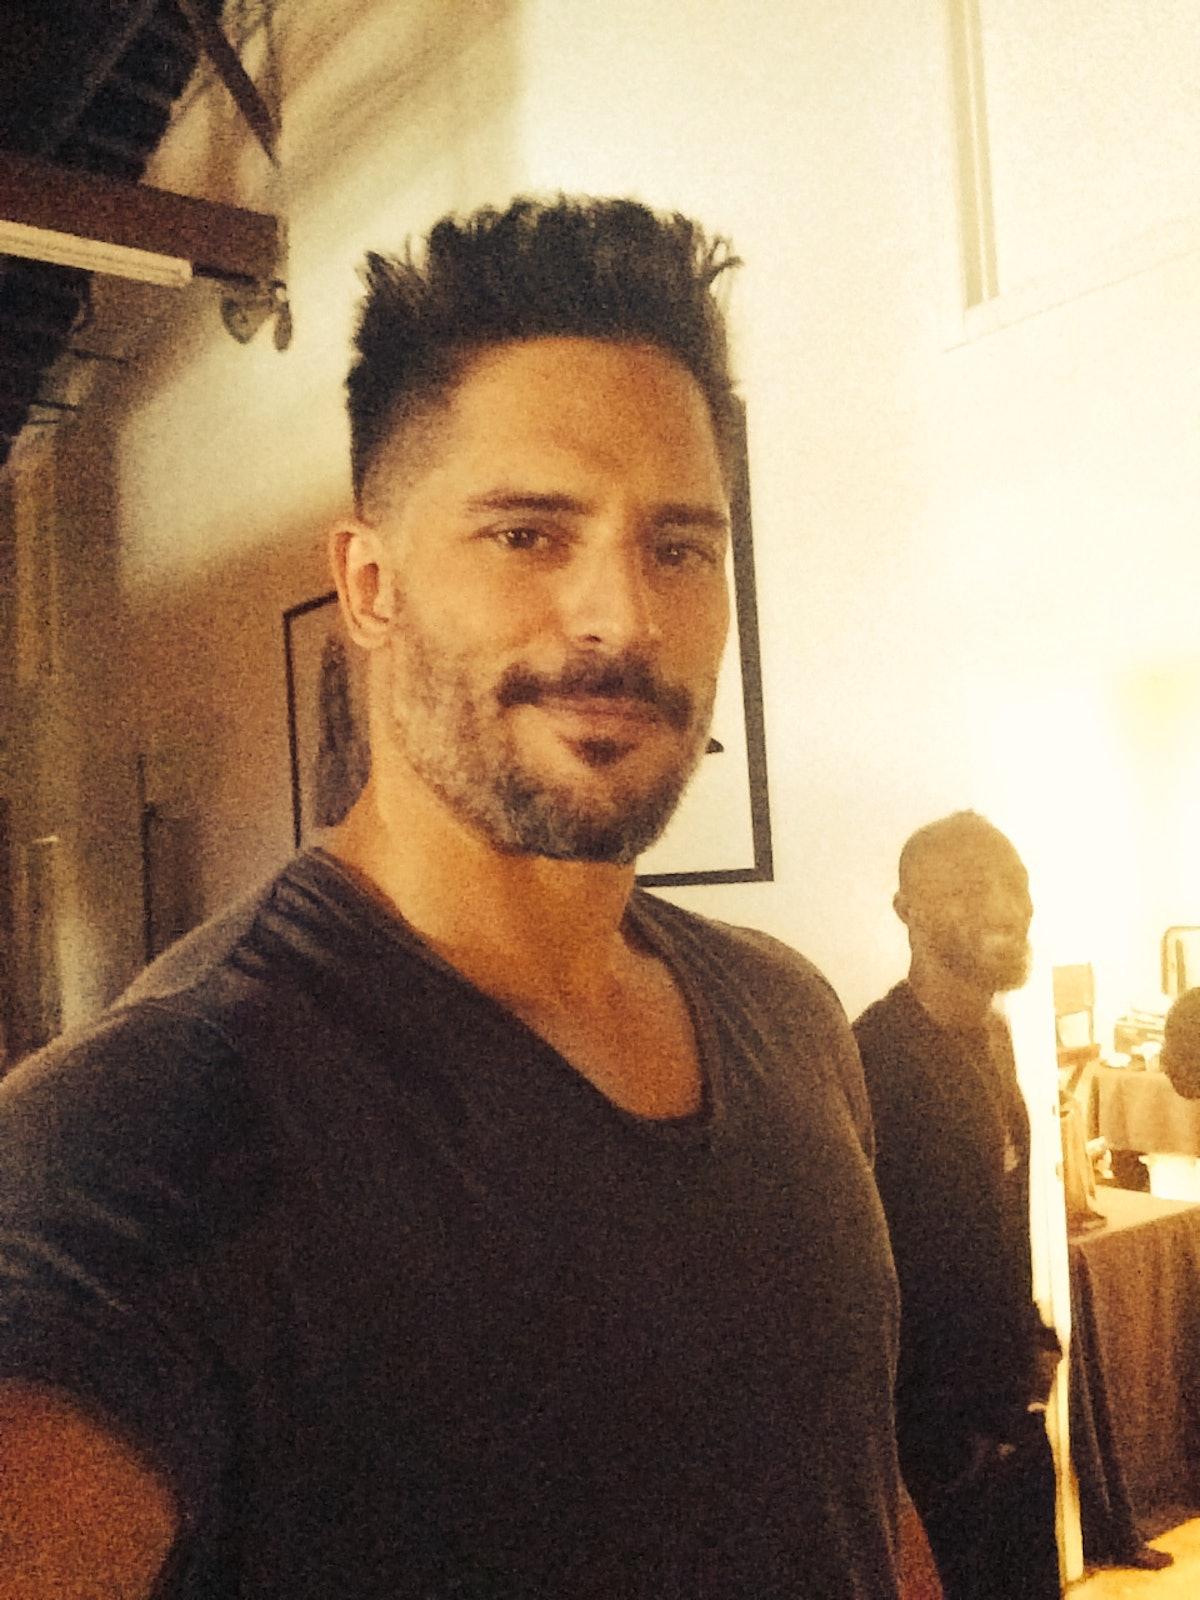 Joe Manganiello selfie